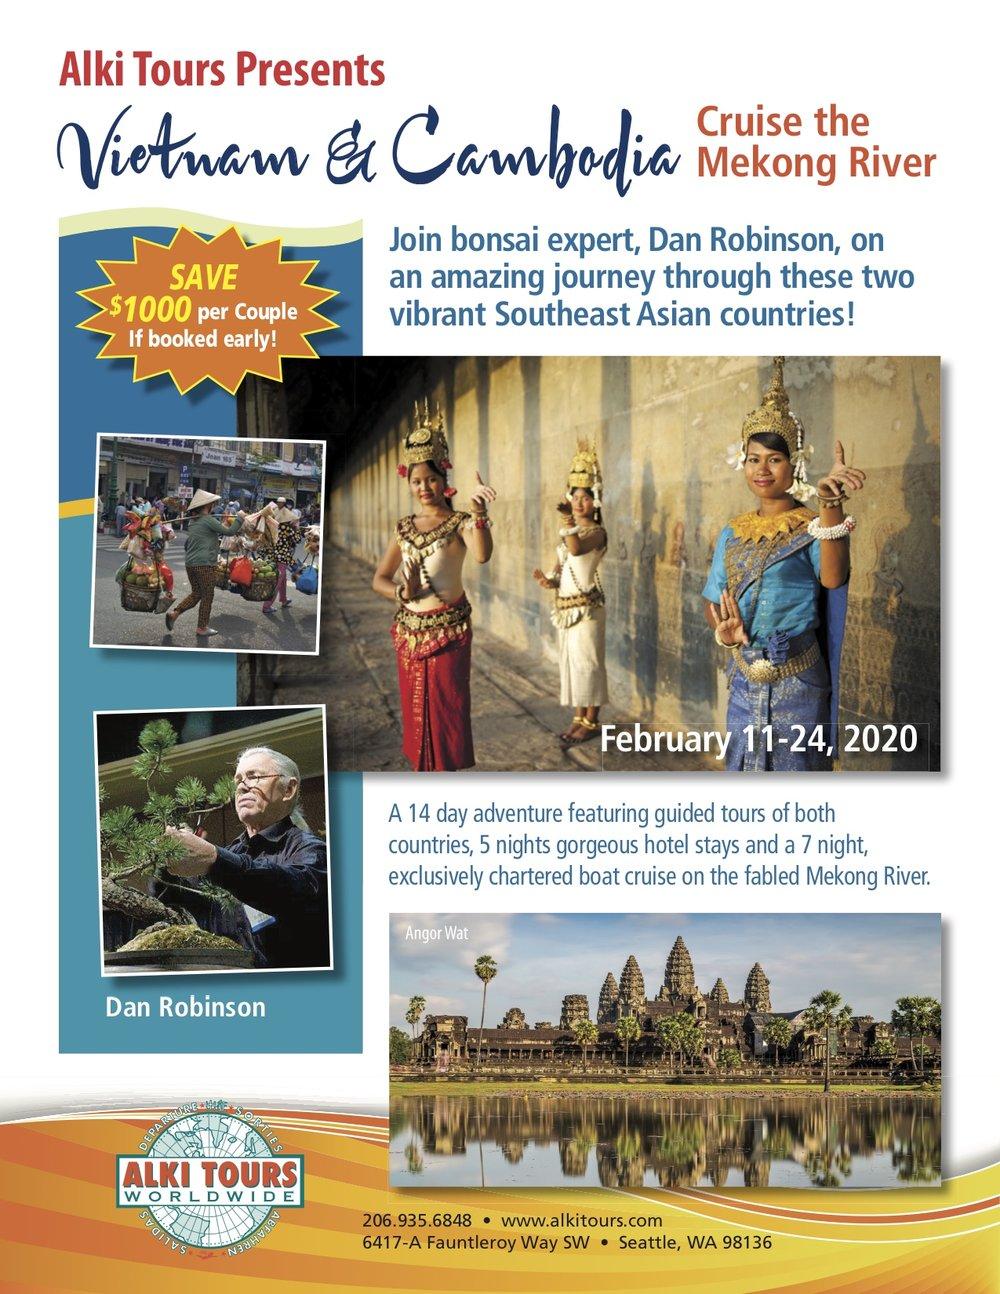 Mekong River Dan Robinson cruise flyer.jpg